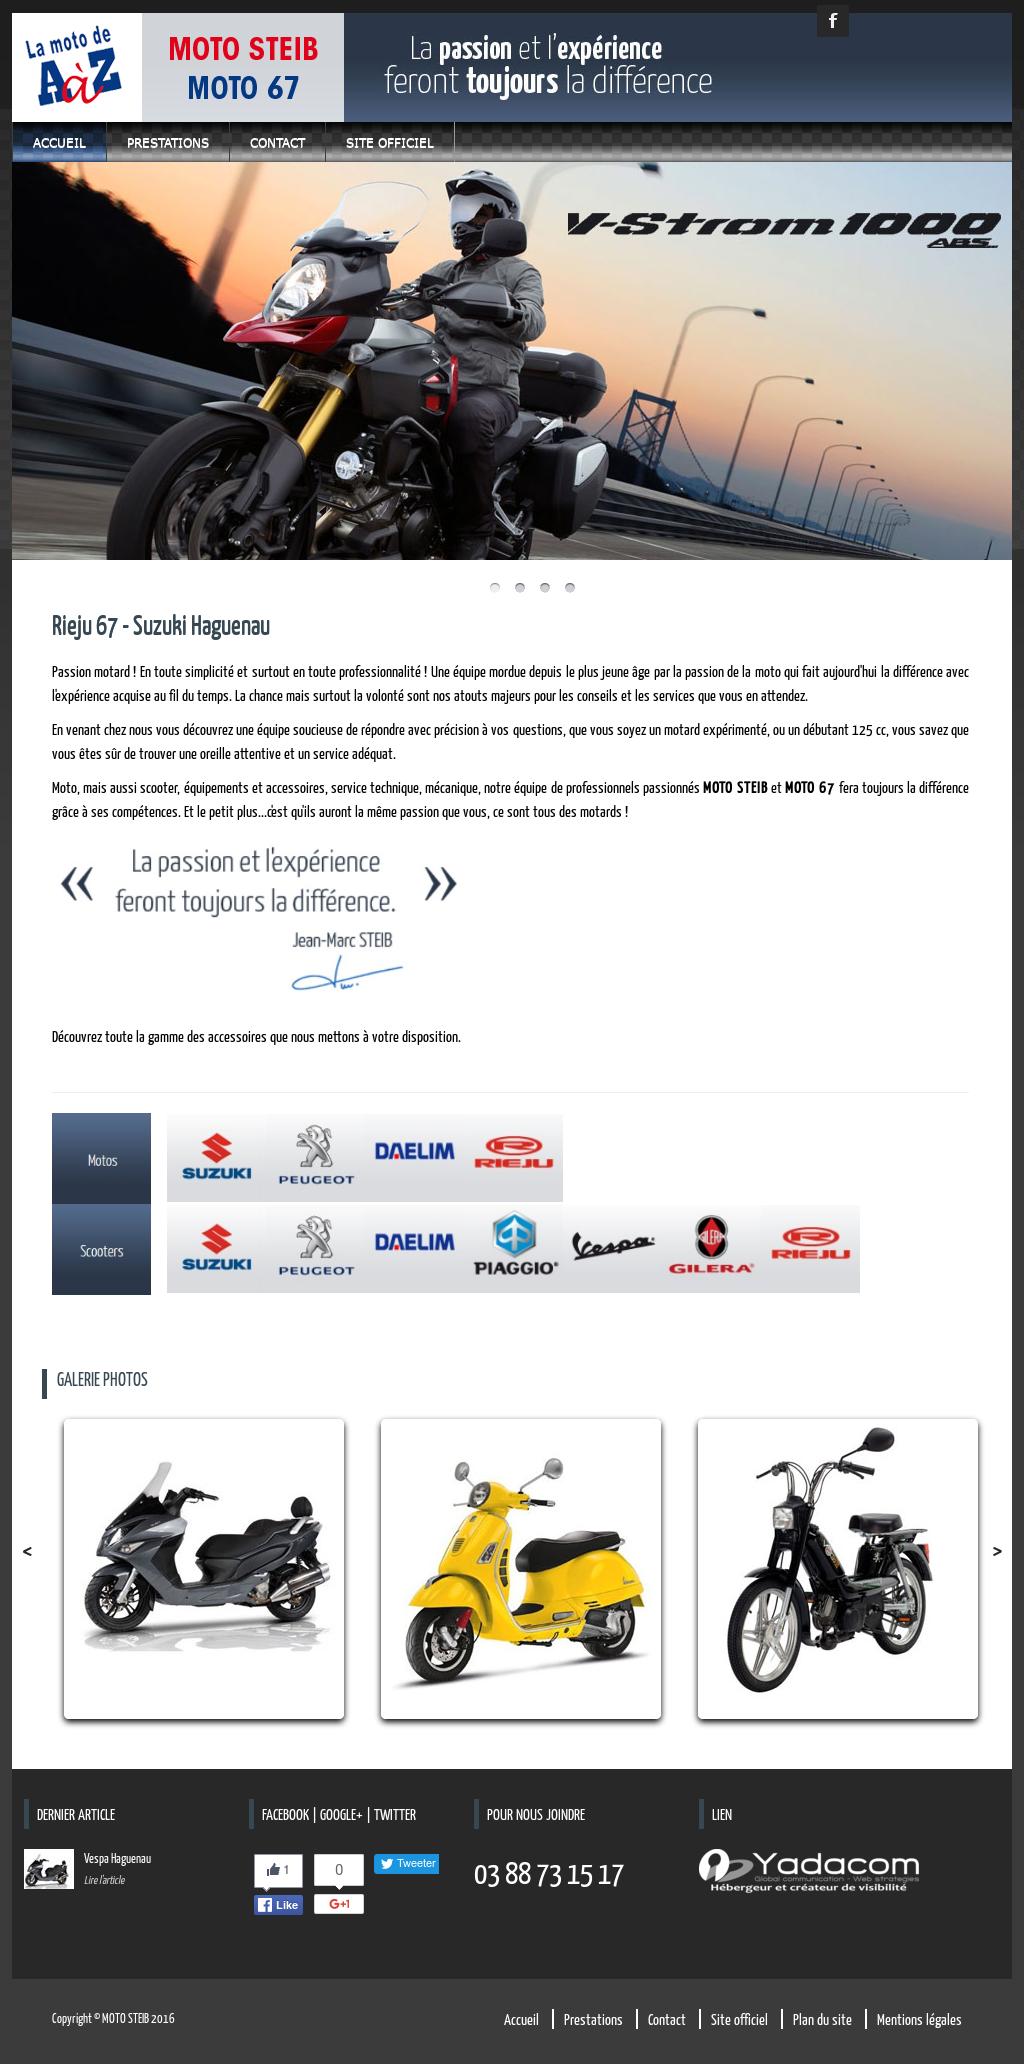 Moto Steib Competitors, Revenue and Employees - Owler Company Profile